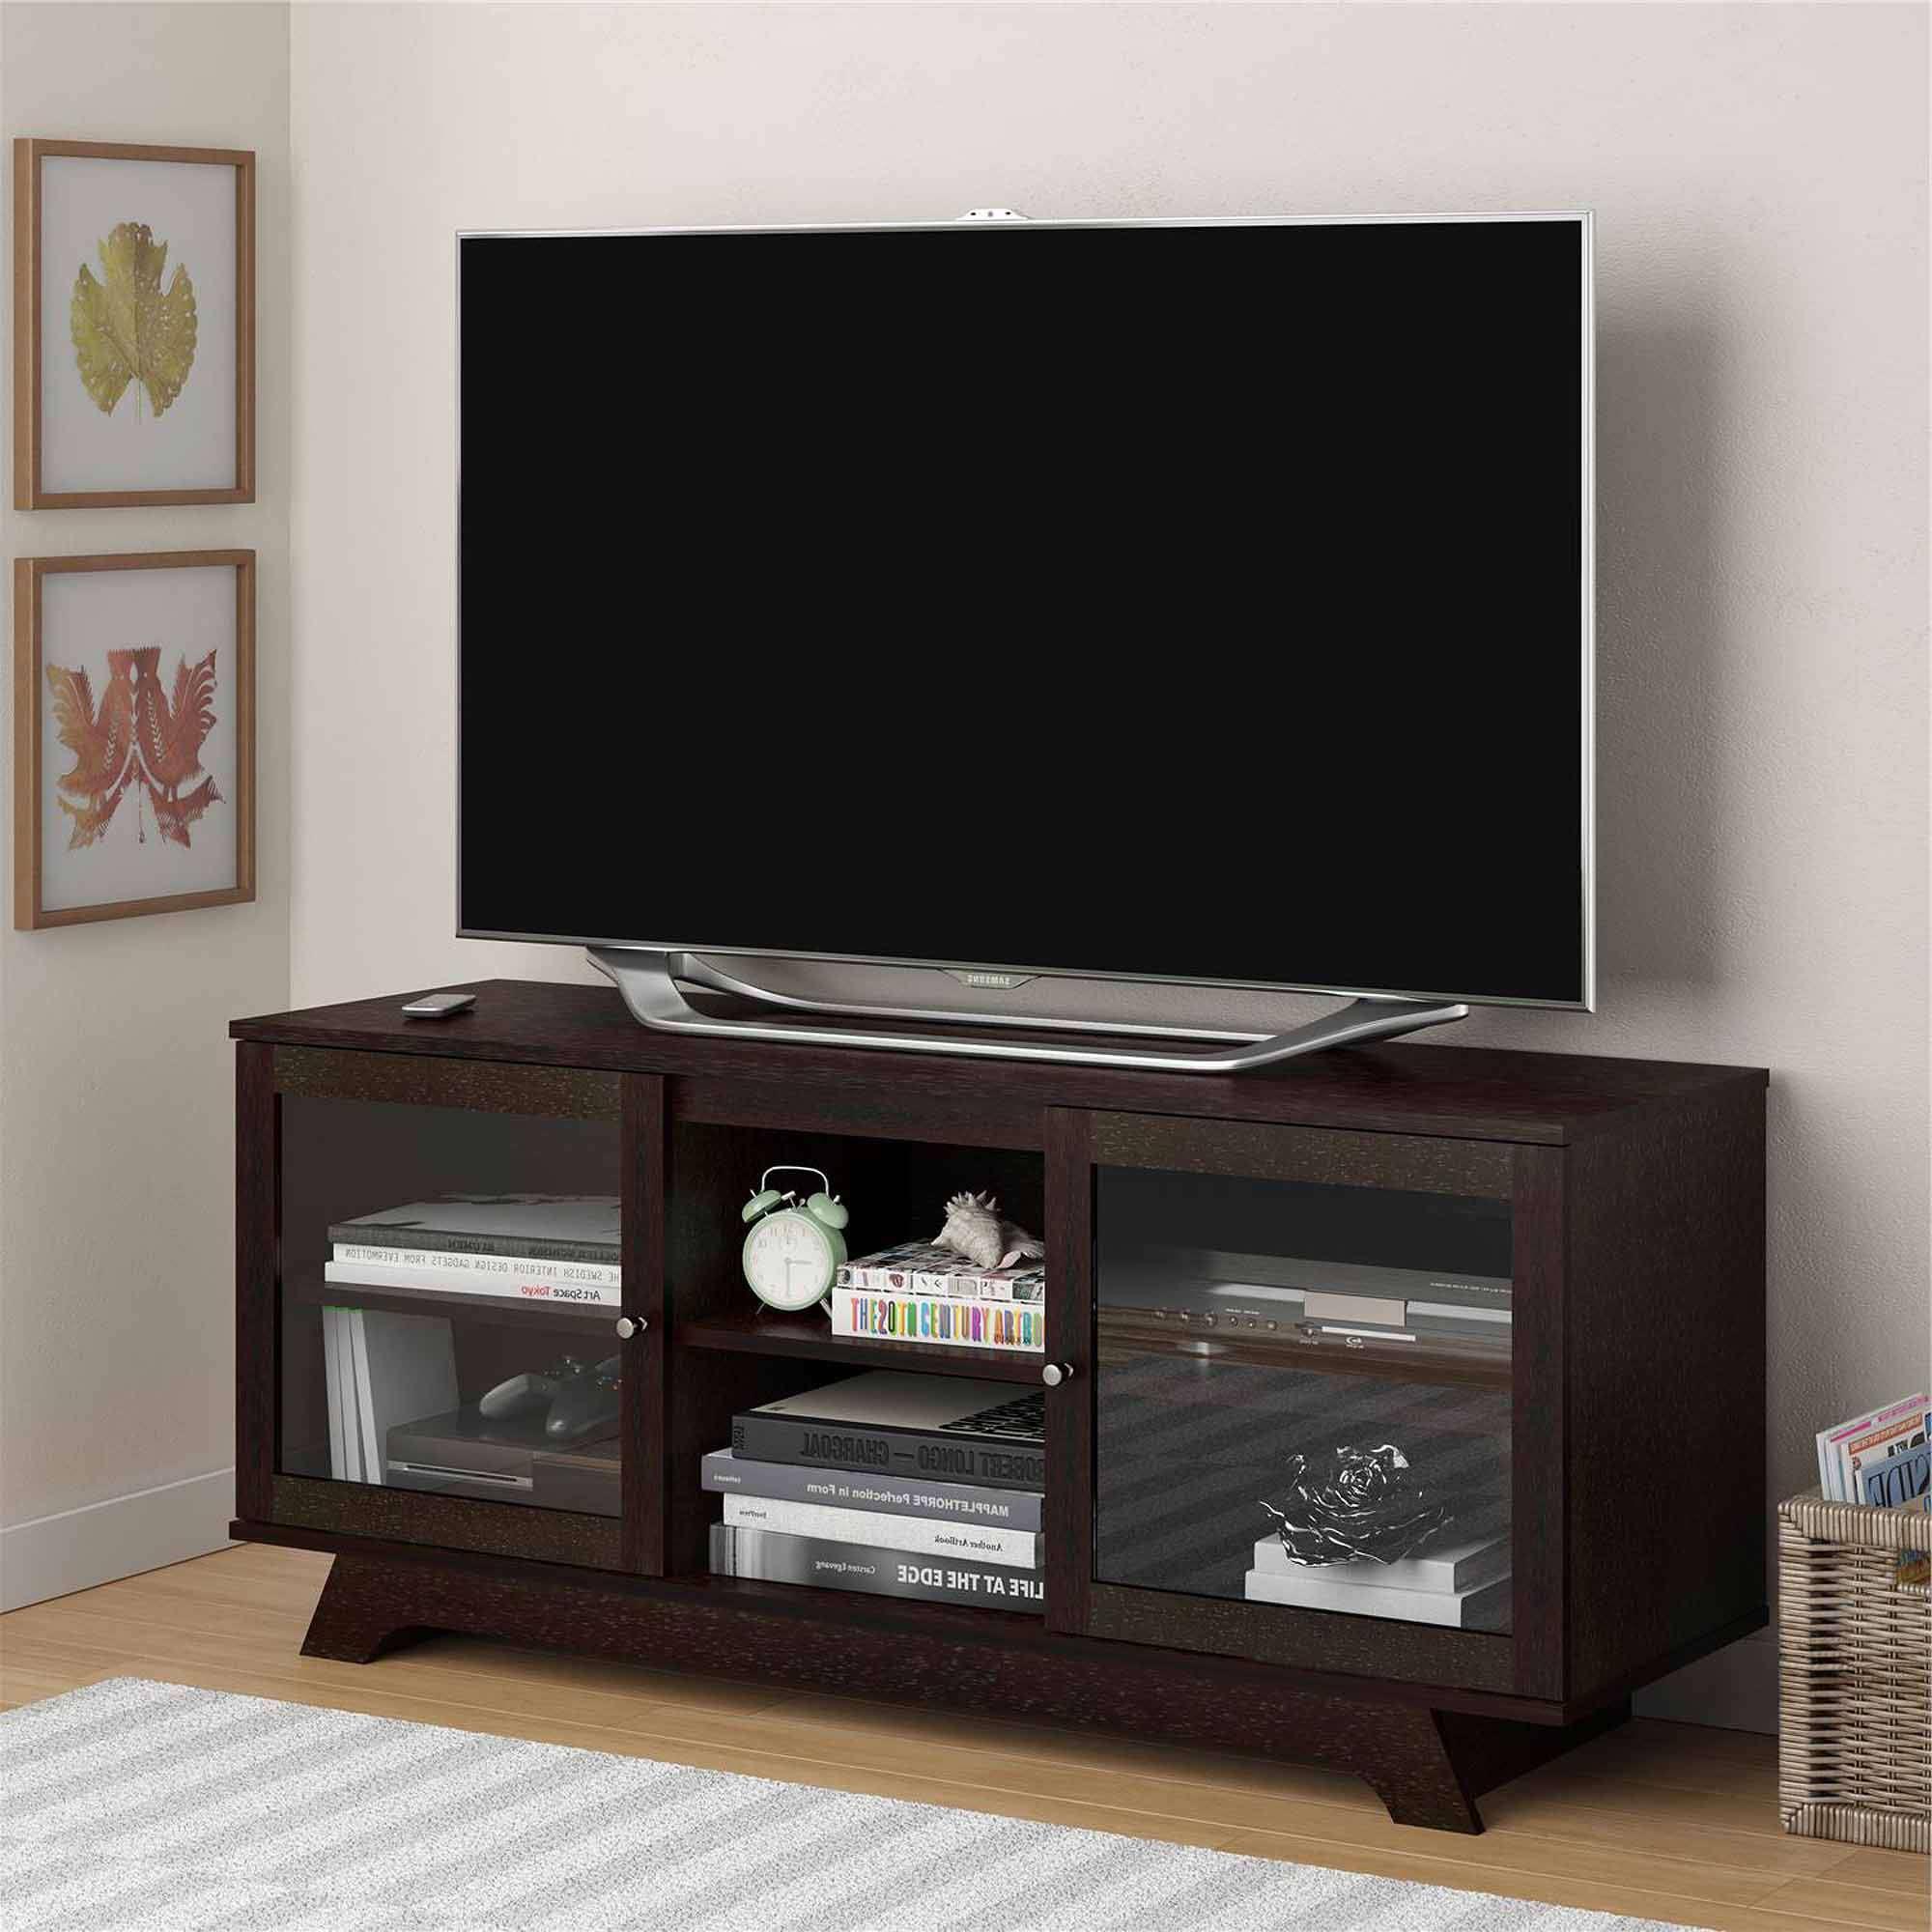 Tv Stands & Entertainment Centers – Walmart Regarding Cabinet Tv Stands (View 11 of 15)